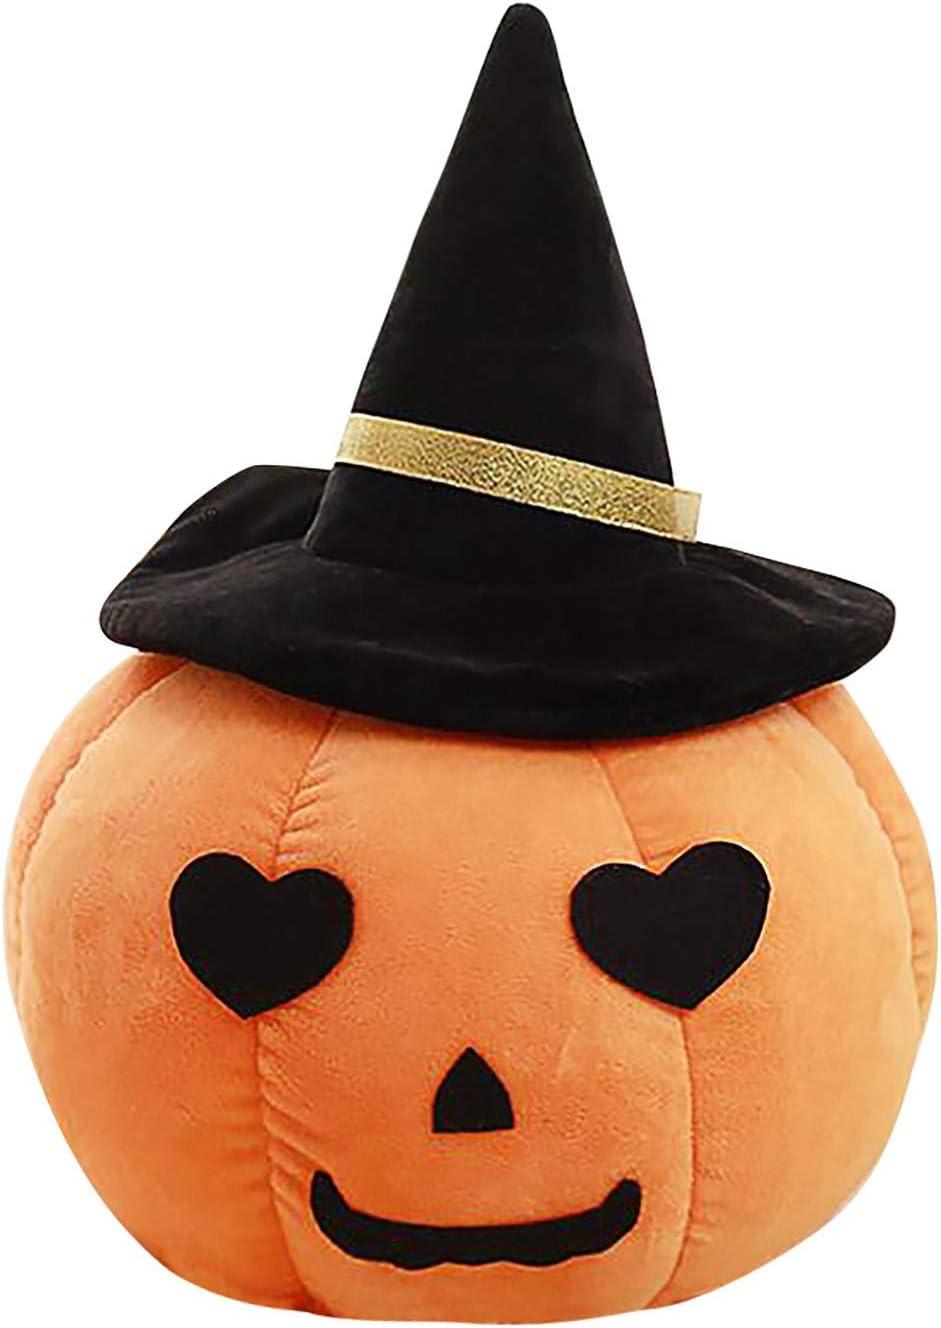 Binory Pumpkin Shaped Pillow Wearing a Witch Hat Pumpkin Stuffed Animals Cushion Halloween Plush Toys for Home Office Decors,Creative Soft Lumbar Back Support Decorative Throw Pillow Gift,B 5.5inch